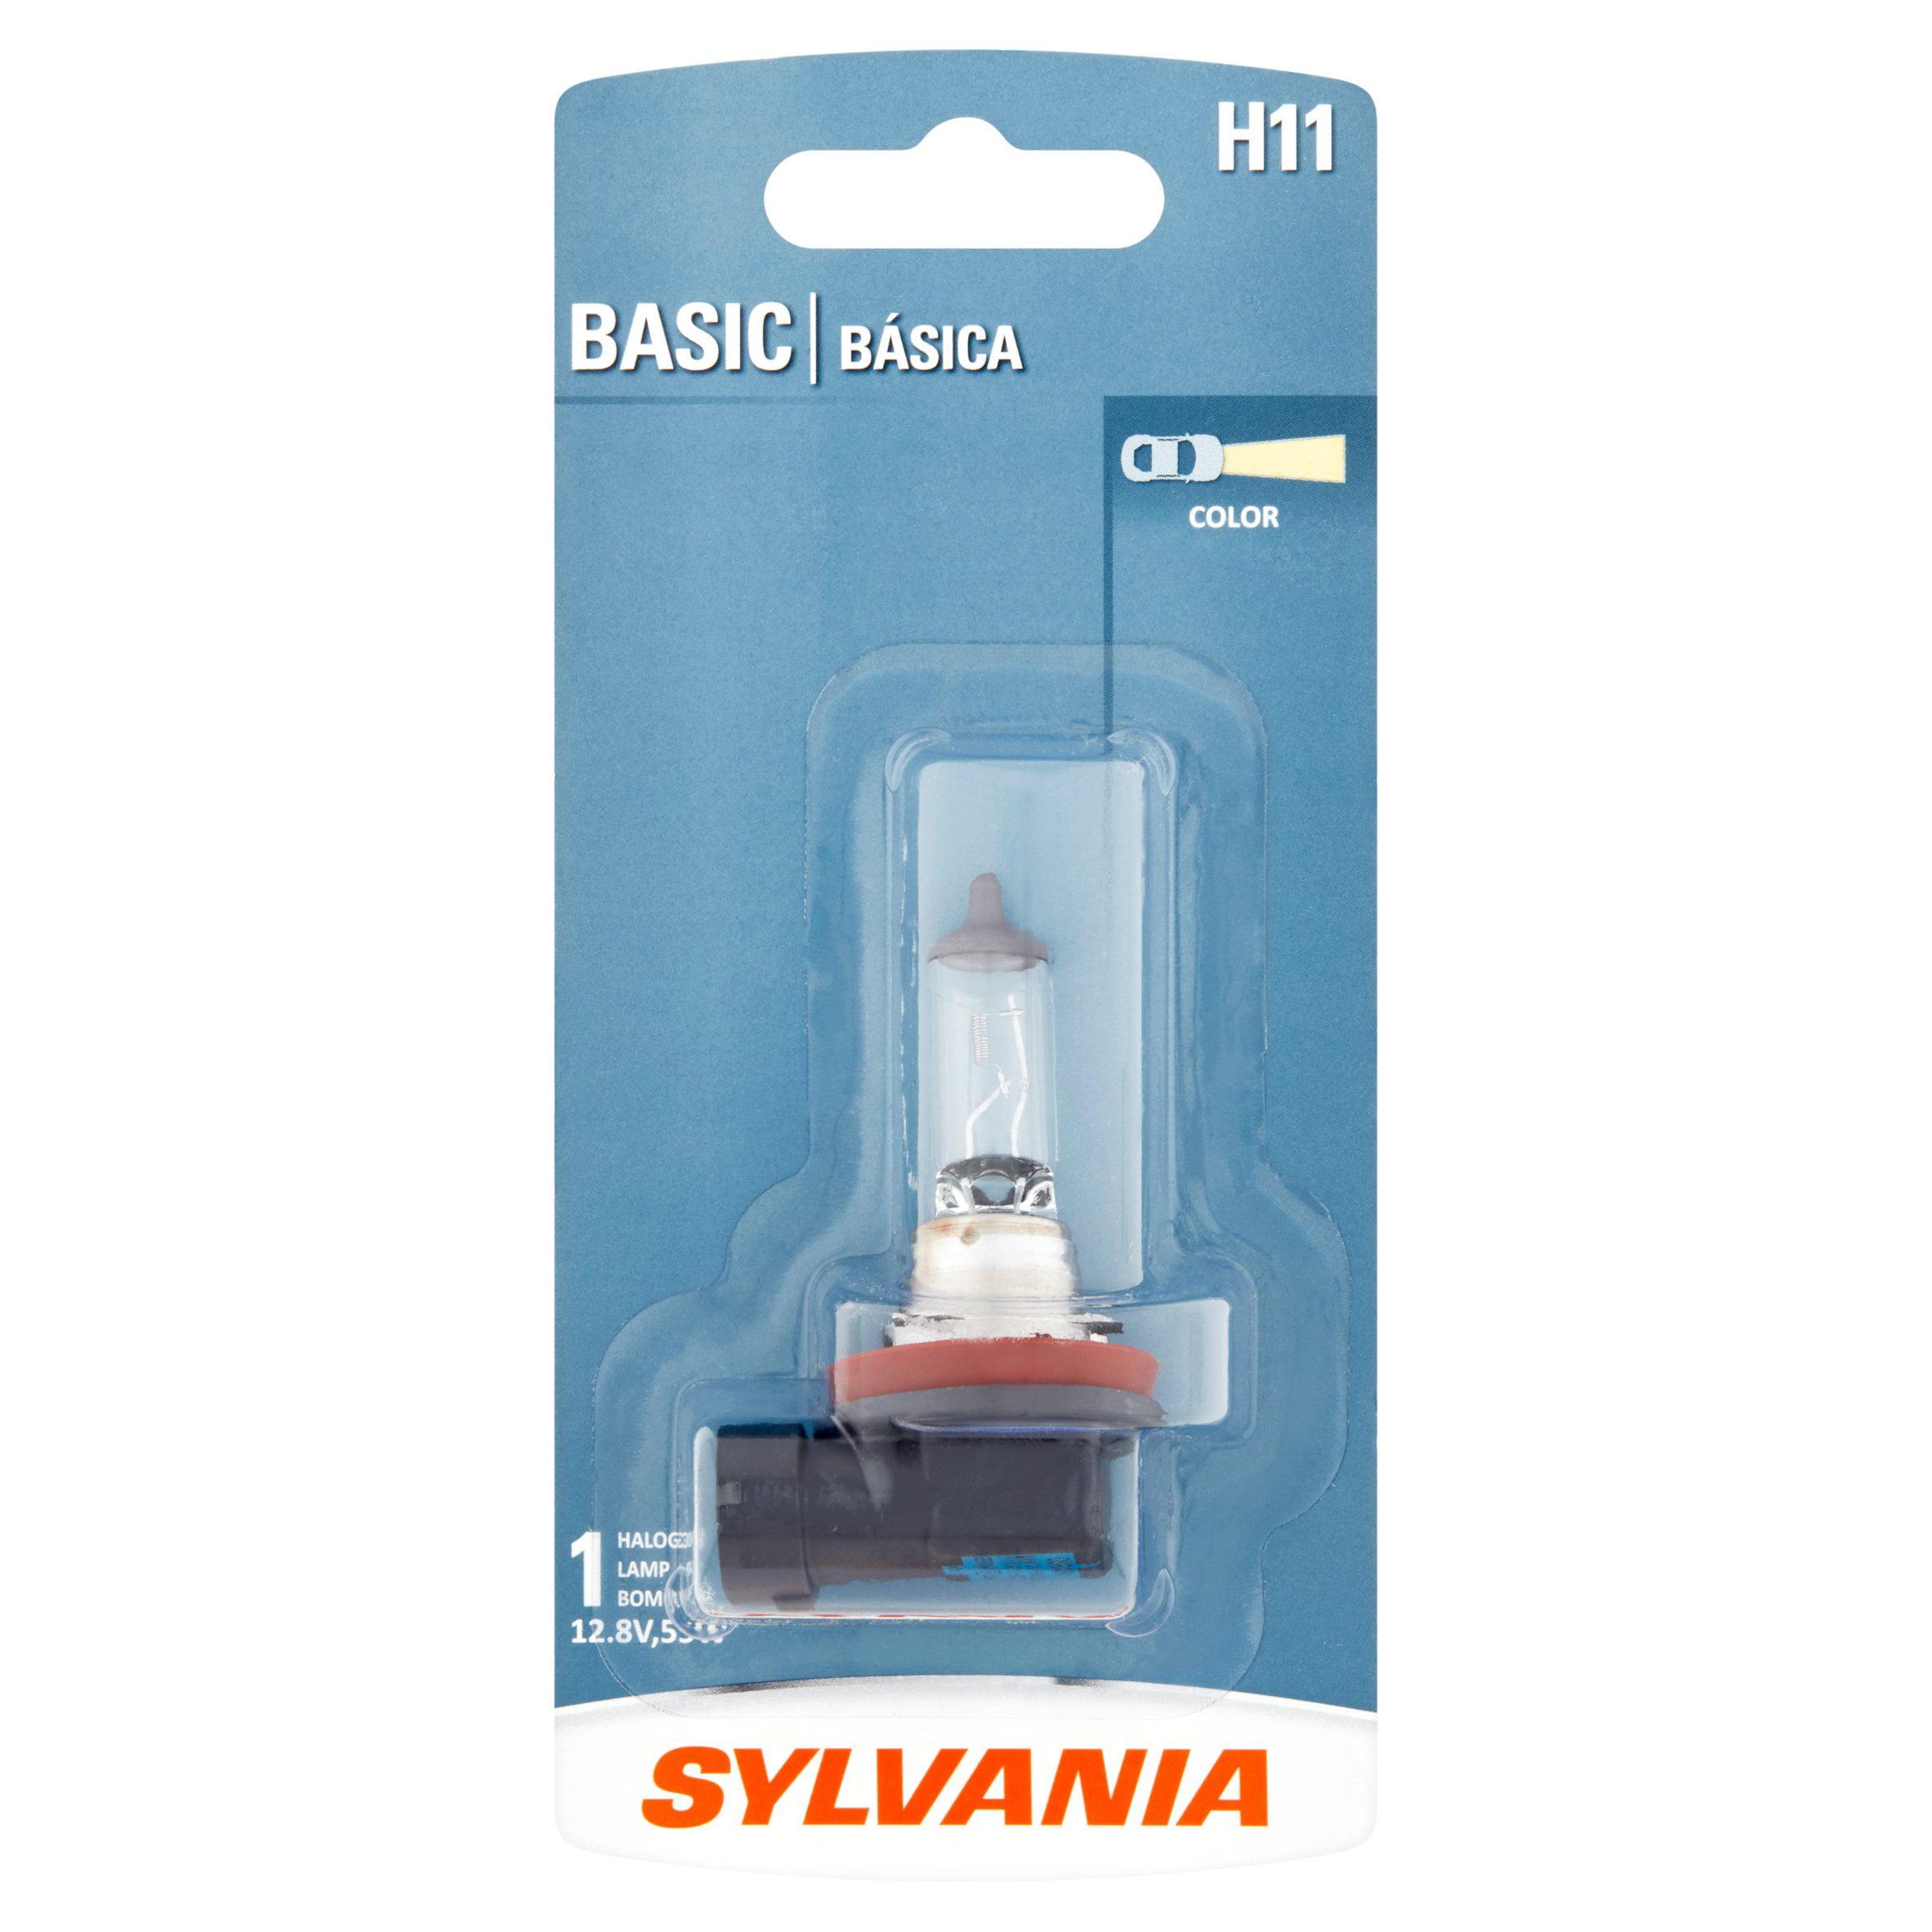 Sylvania H11 Basic Halogen Headlight Bulb, Pack of 1